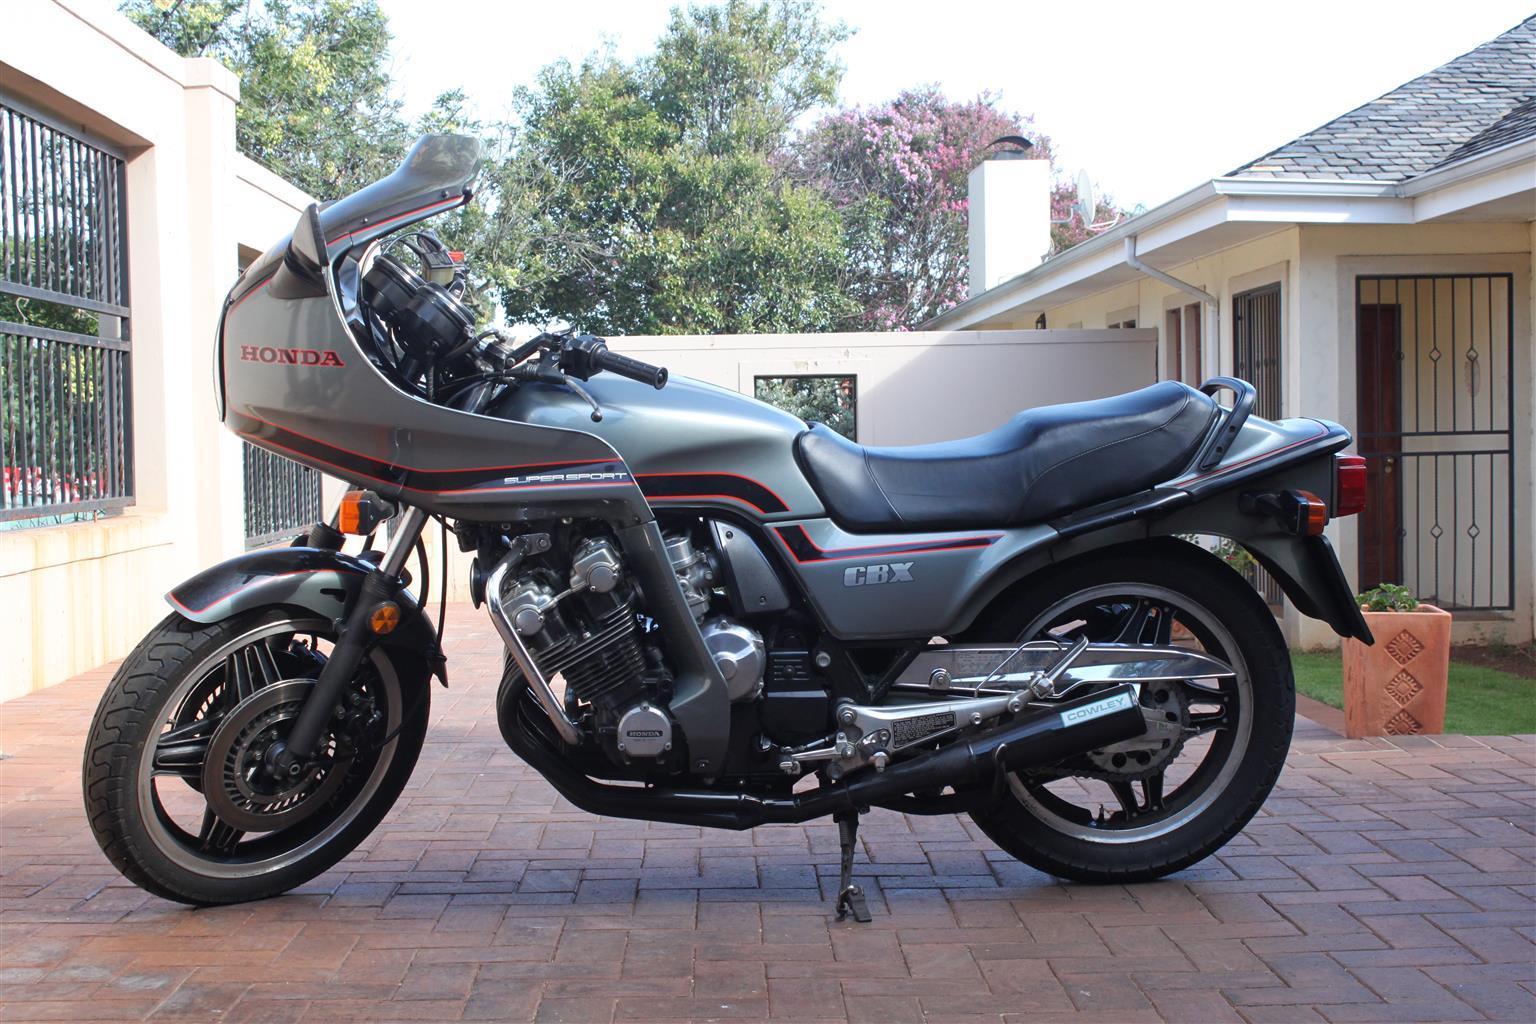 1982 Honda CBX 1000 6 cylinder